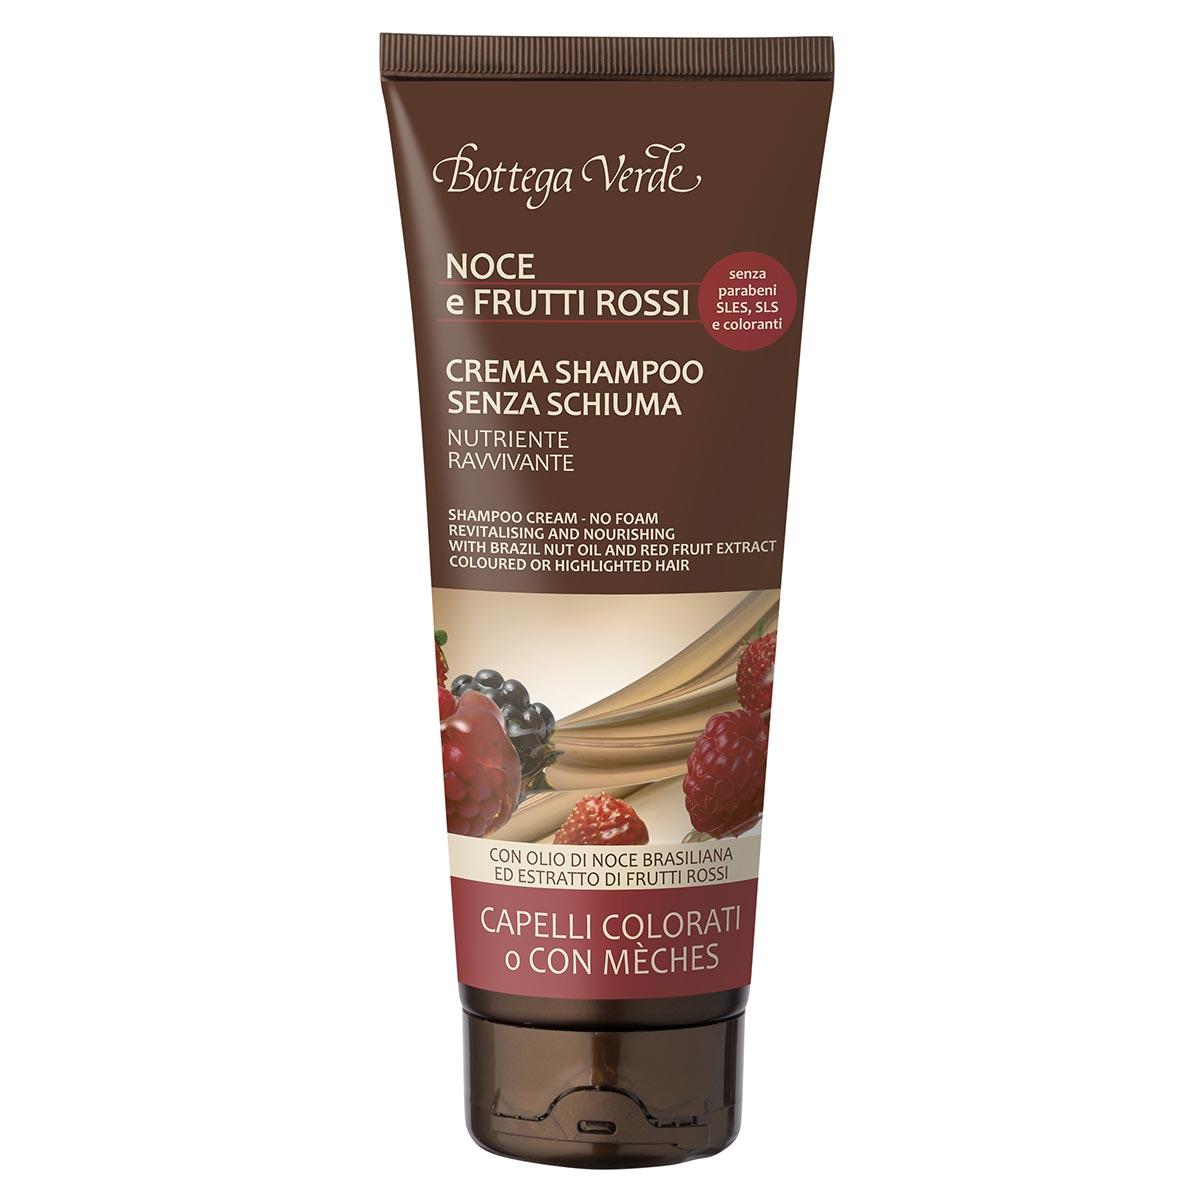 Sampon-crema fara spuma cu ulei de nuci braziliene si extract de fructe rosii - Olio di Nocce e Frutti Rossi, 200 ML